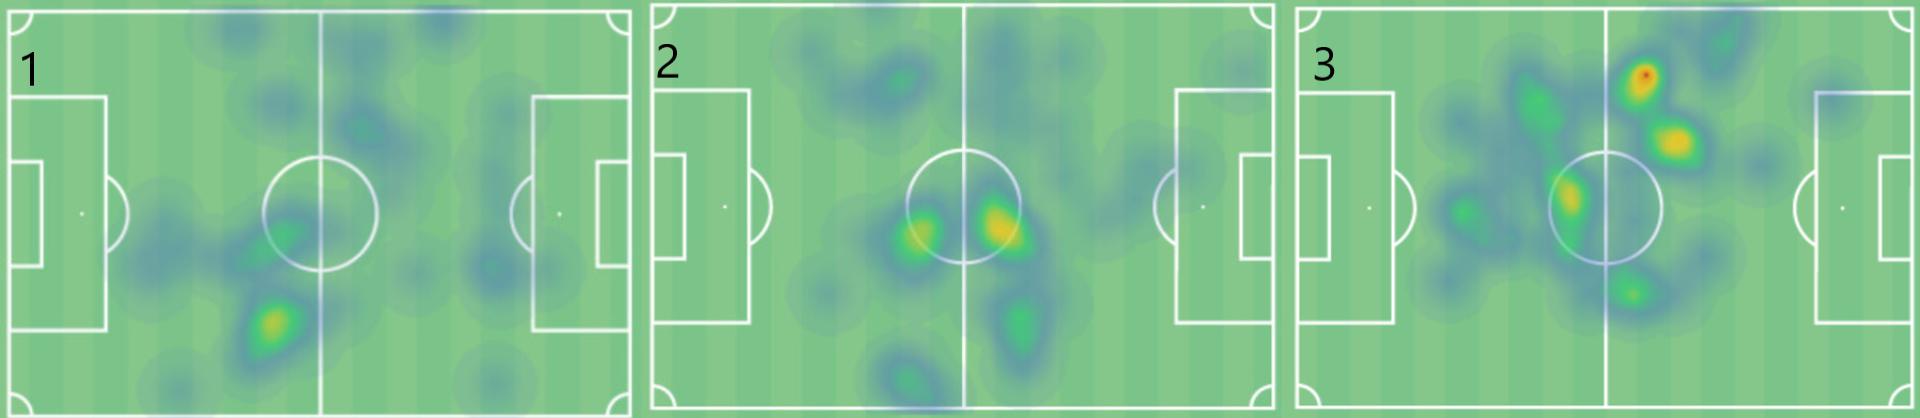 Evaluating Tanguy Ndombele under Jose Mourinho 2019/20 - scout report - tactical analysis tactics